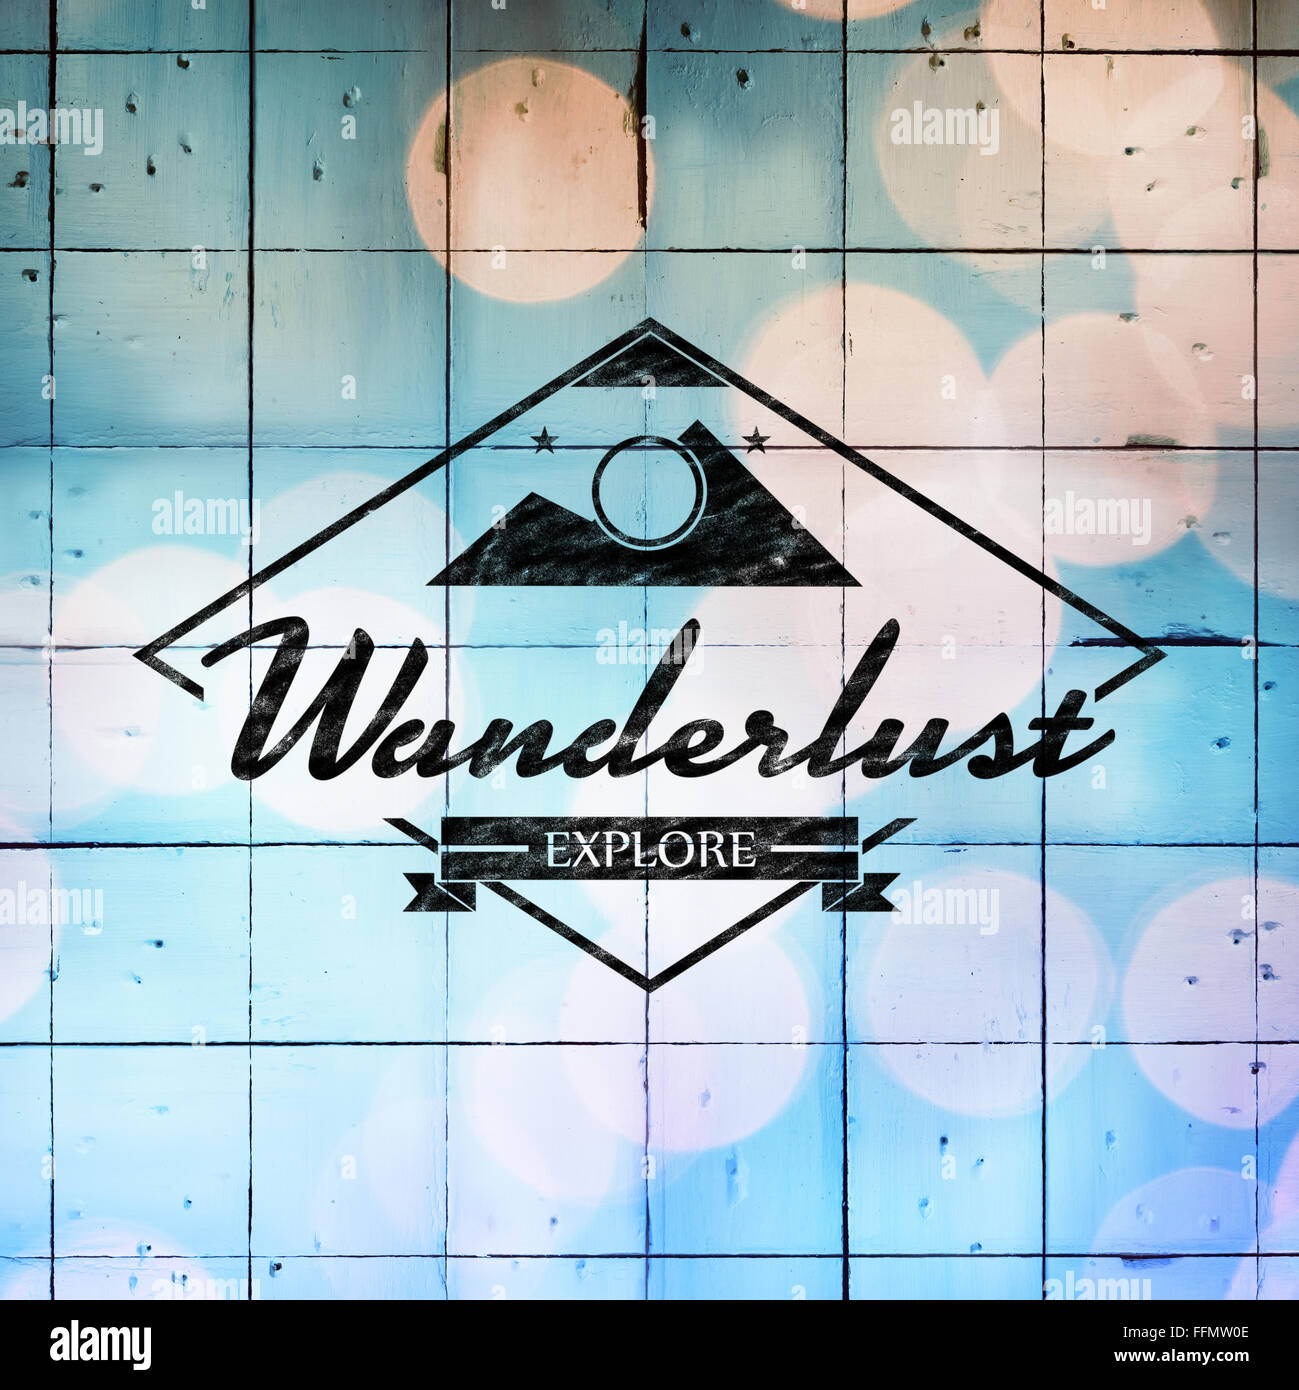 Composite image of wanderlust logo - Stock Image